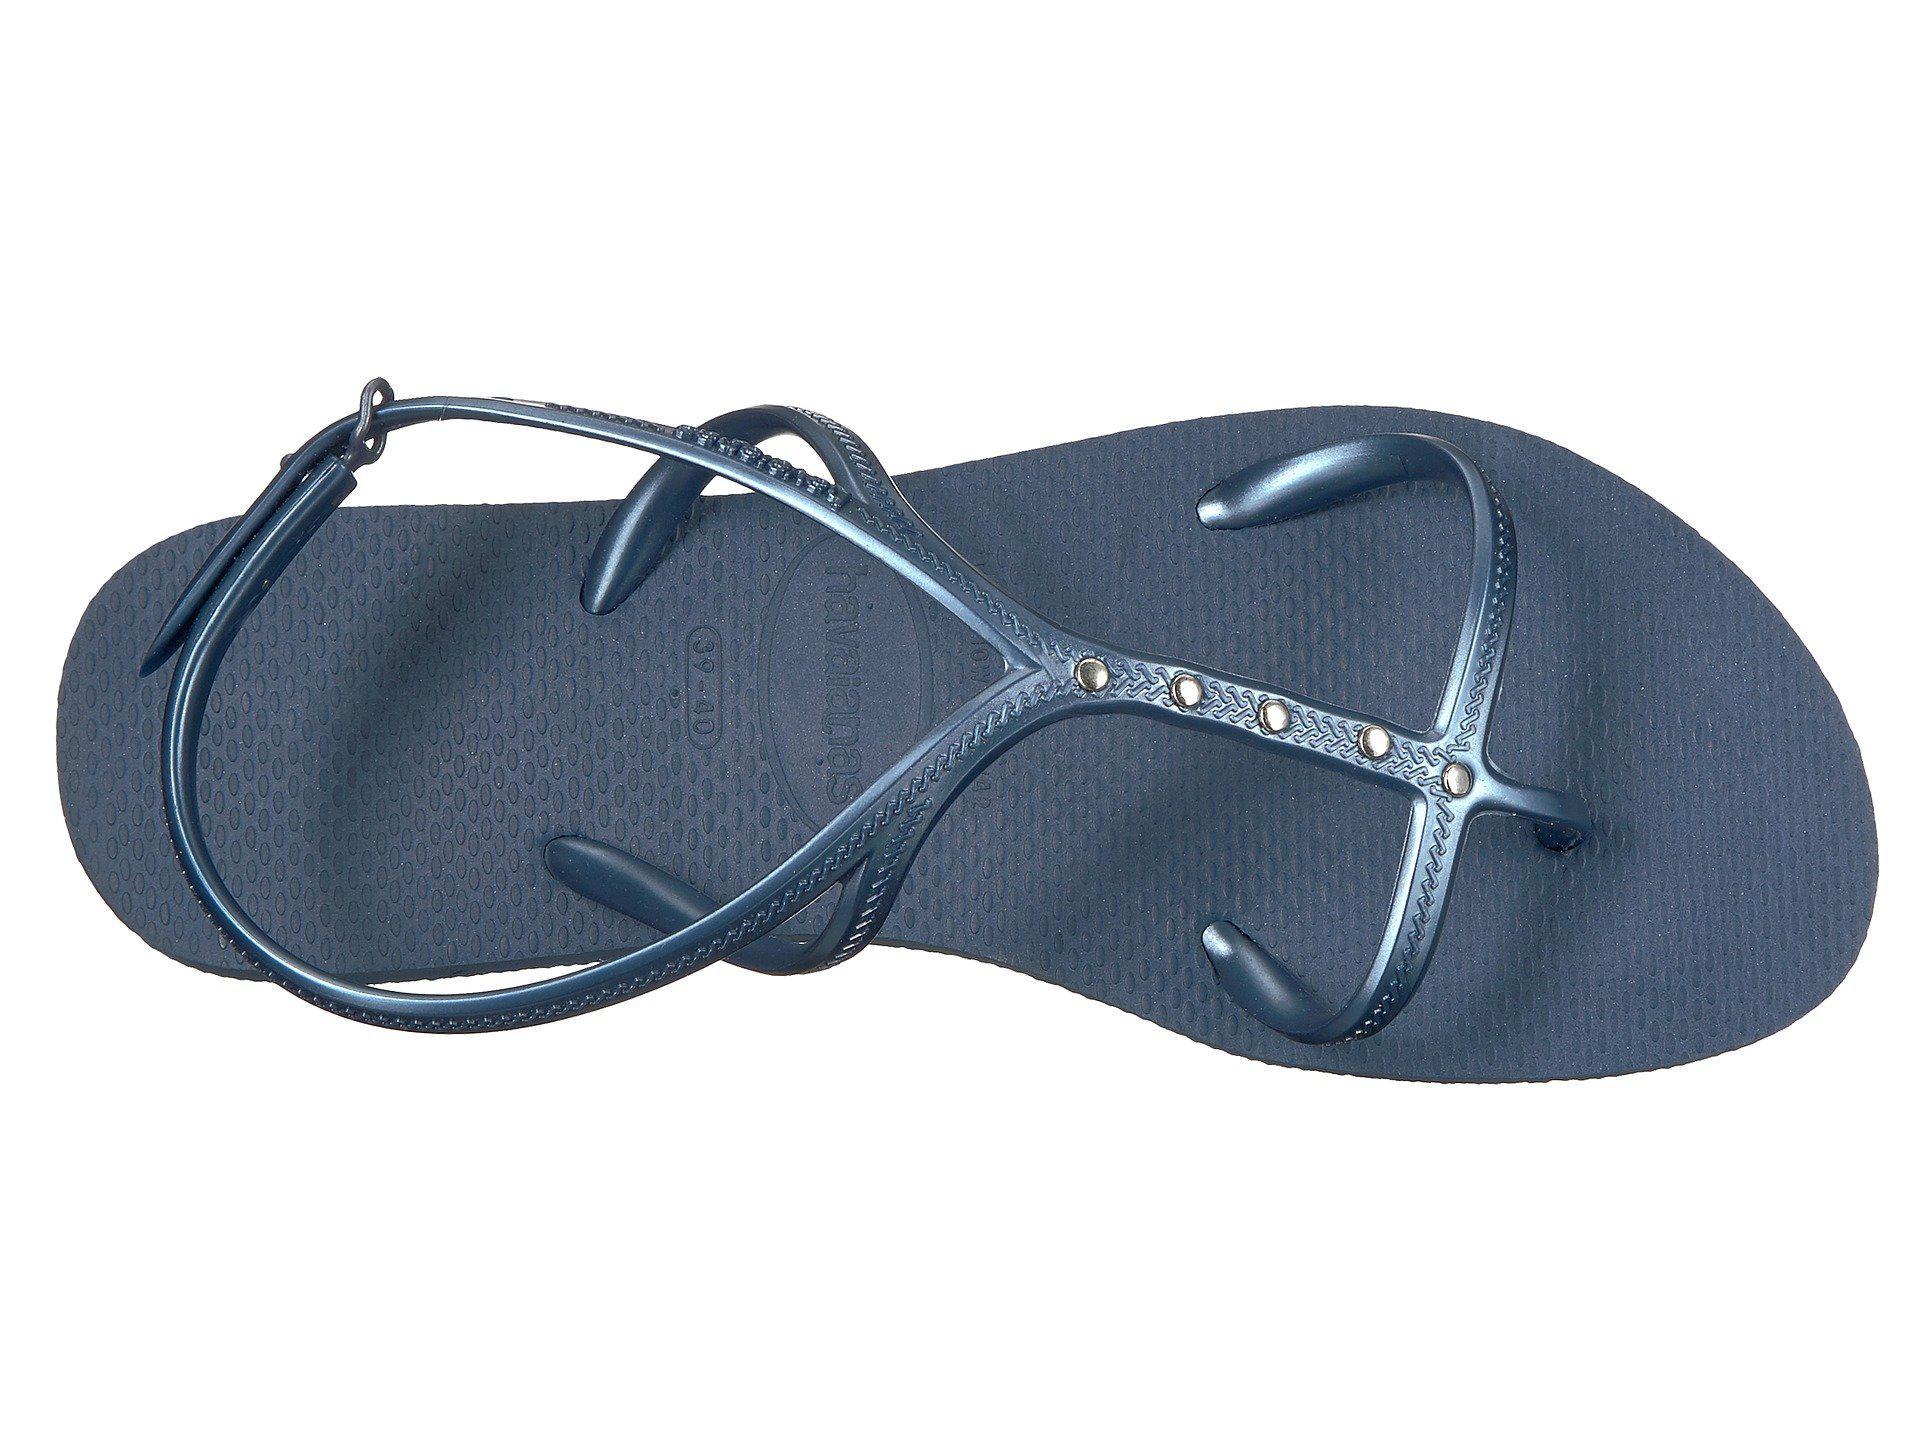 Women's Allure Sandals Havaianas Shoes Marine Red lFu513KJTc